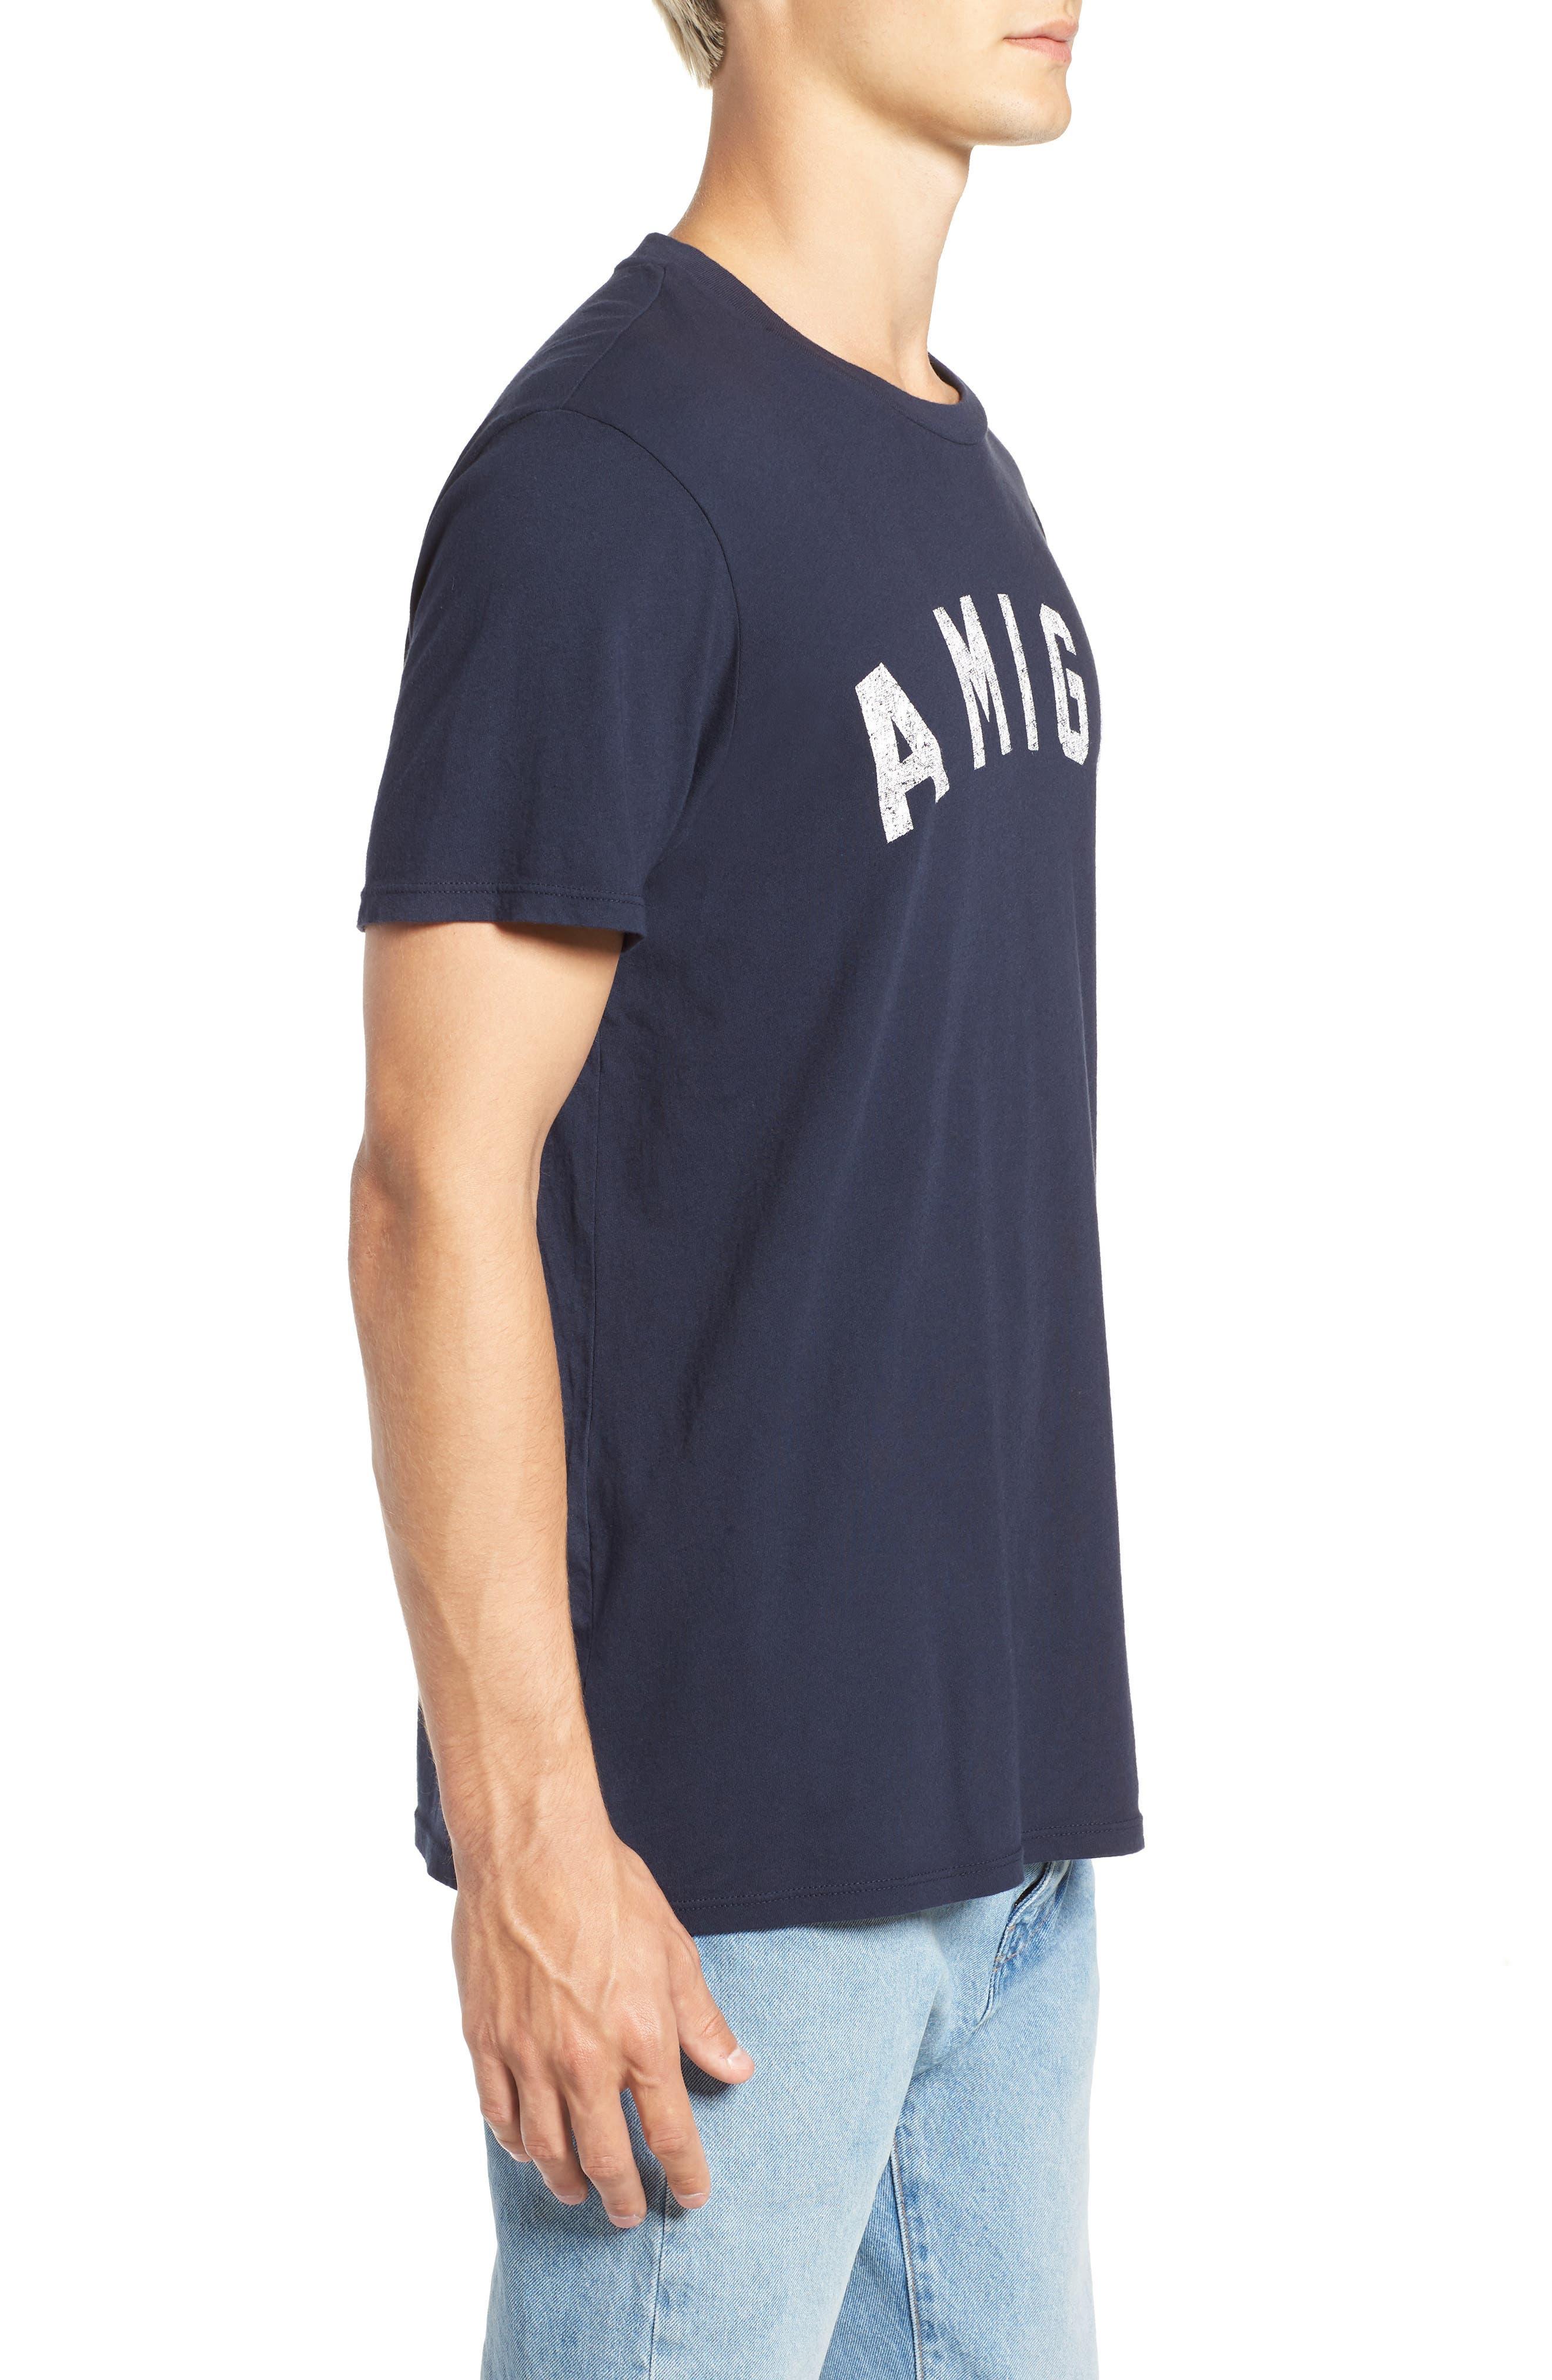 Amigo Graphic T-Shirt,                             Alternate thumbnail 3, color,                             400